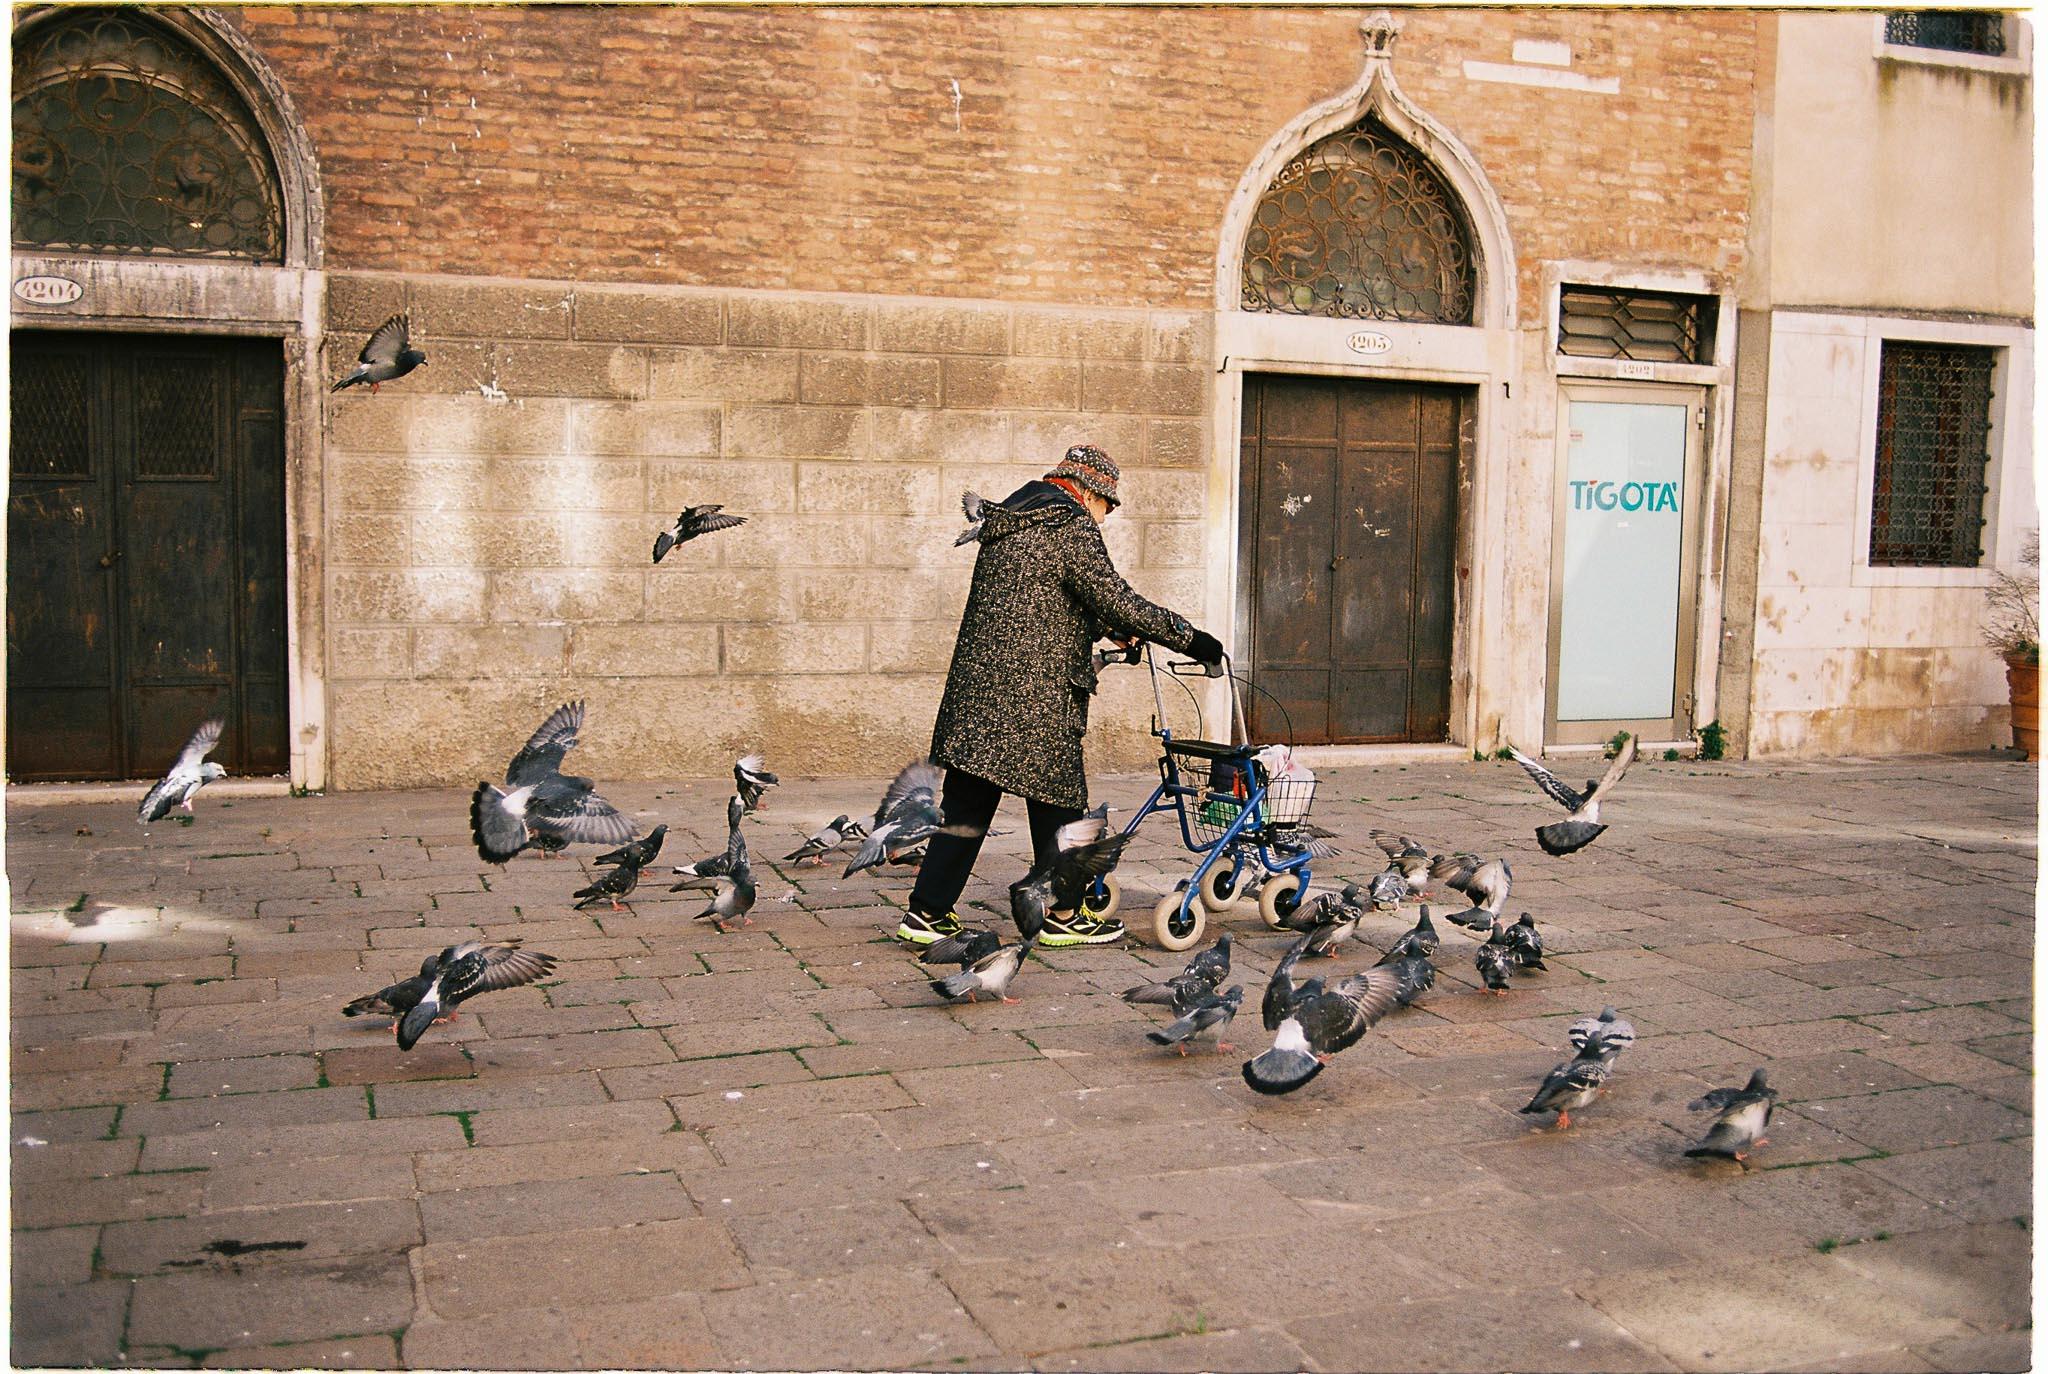 pigeons old grandma feeding pigeons kodak ektar film photography